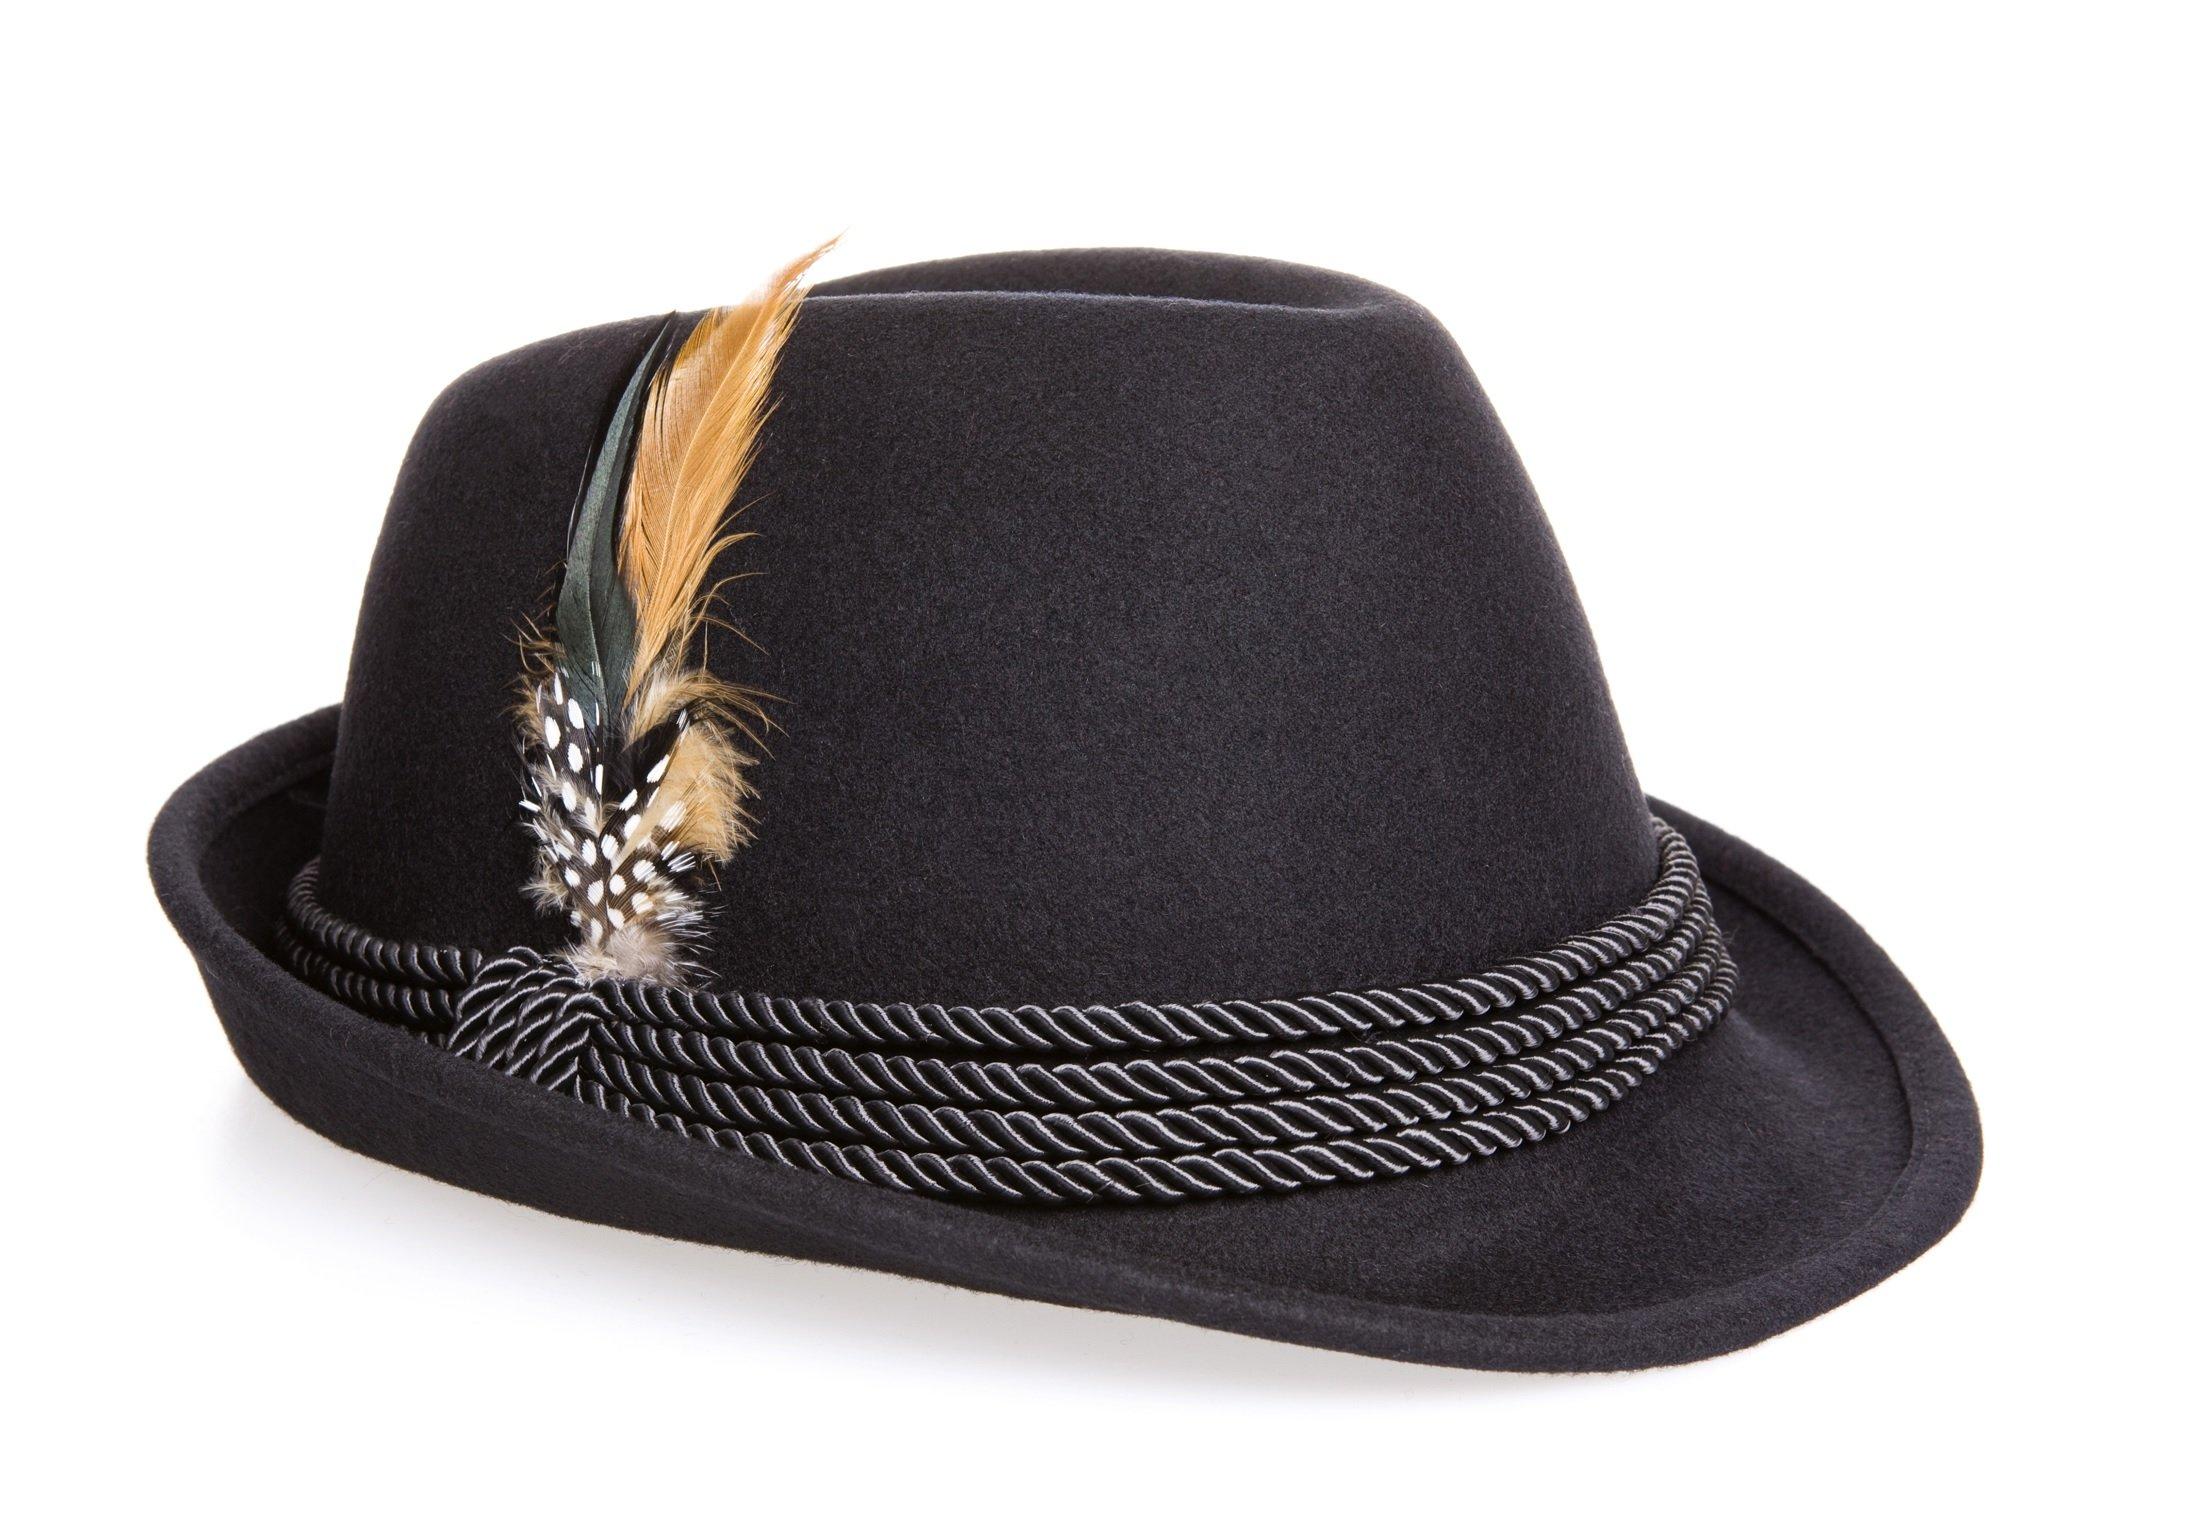 Holiday Oktoberfest Wool Bavarian Alpine Hat - Black Color, Large